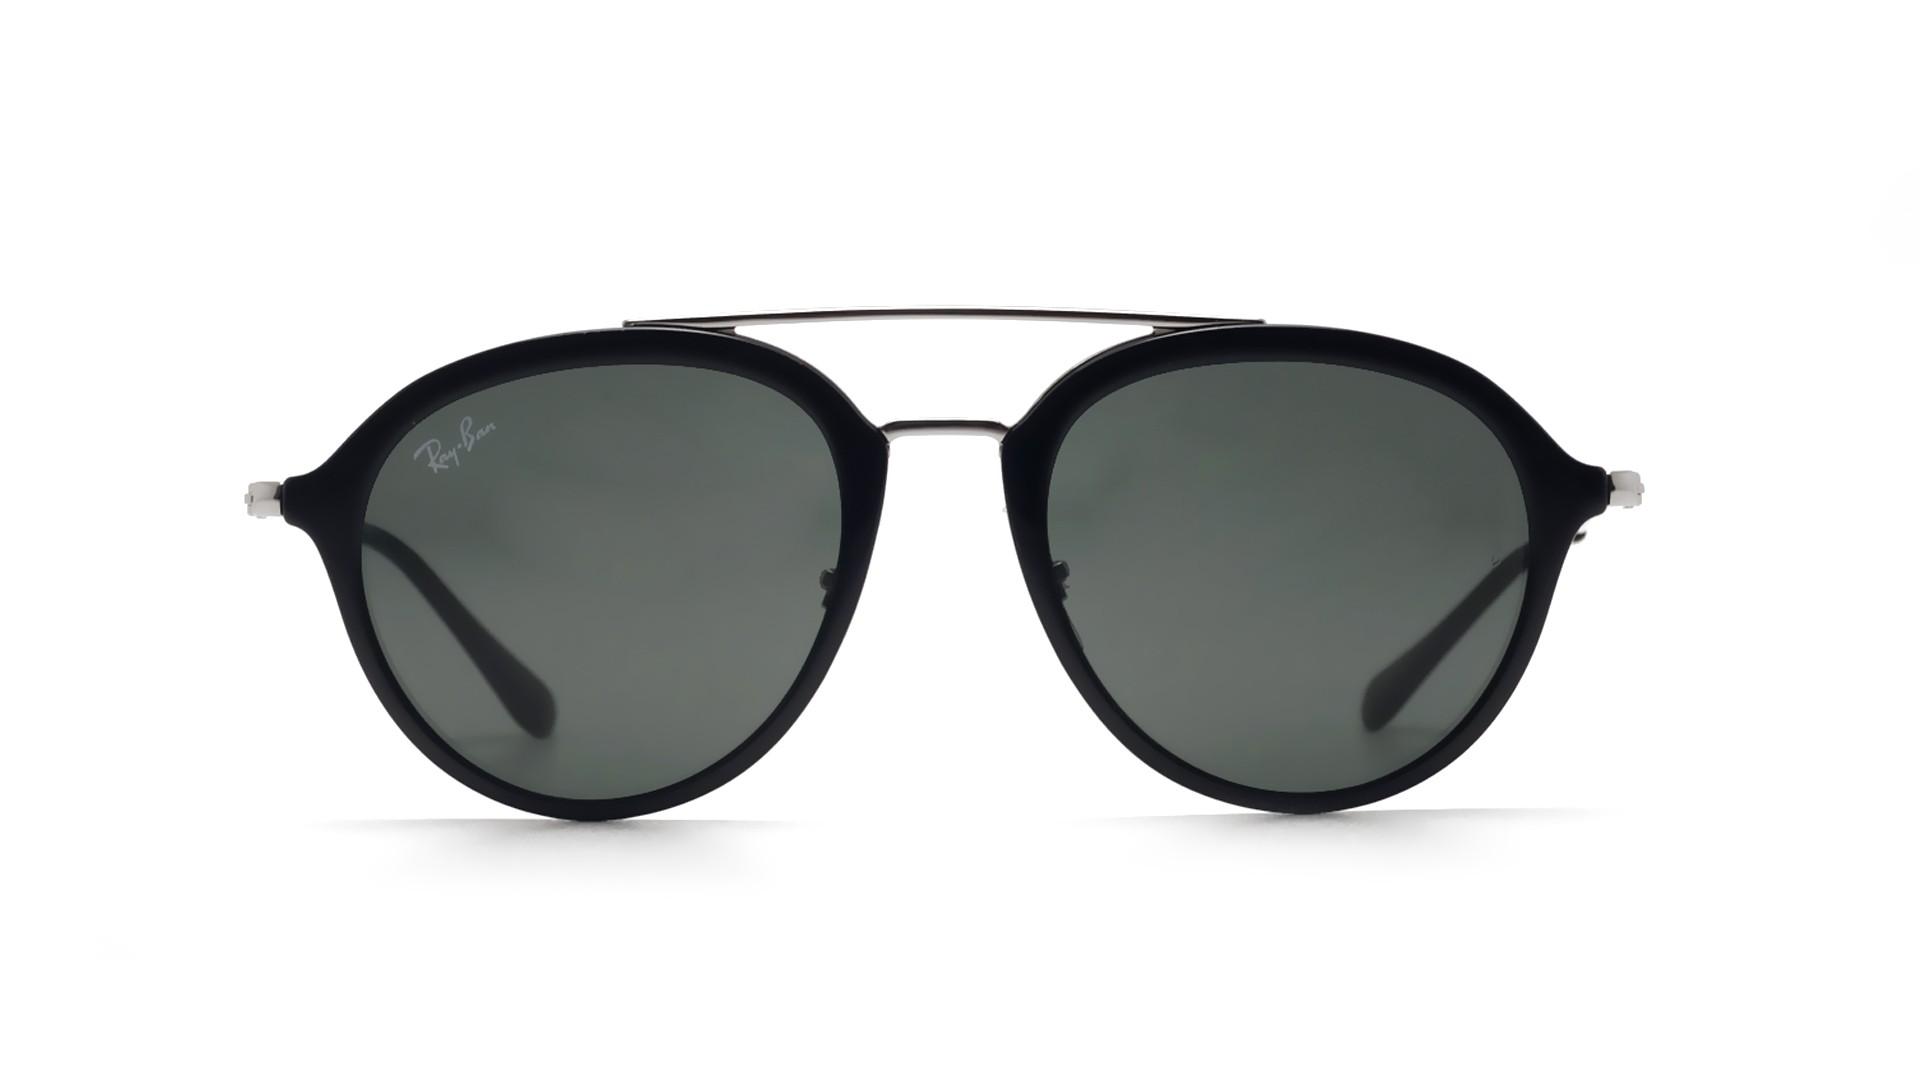 c509e326f315 Sunglasses Ray-Ban RJ9065S 100/71 48-18 Black Junior